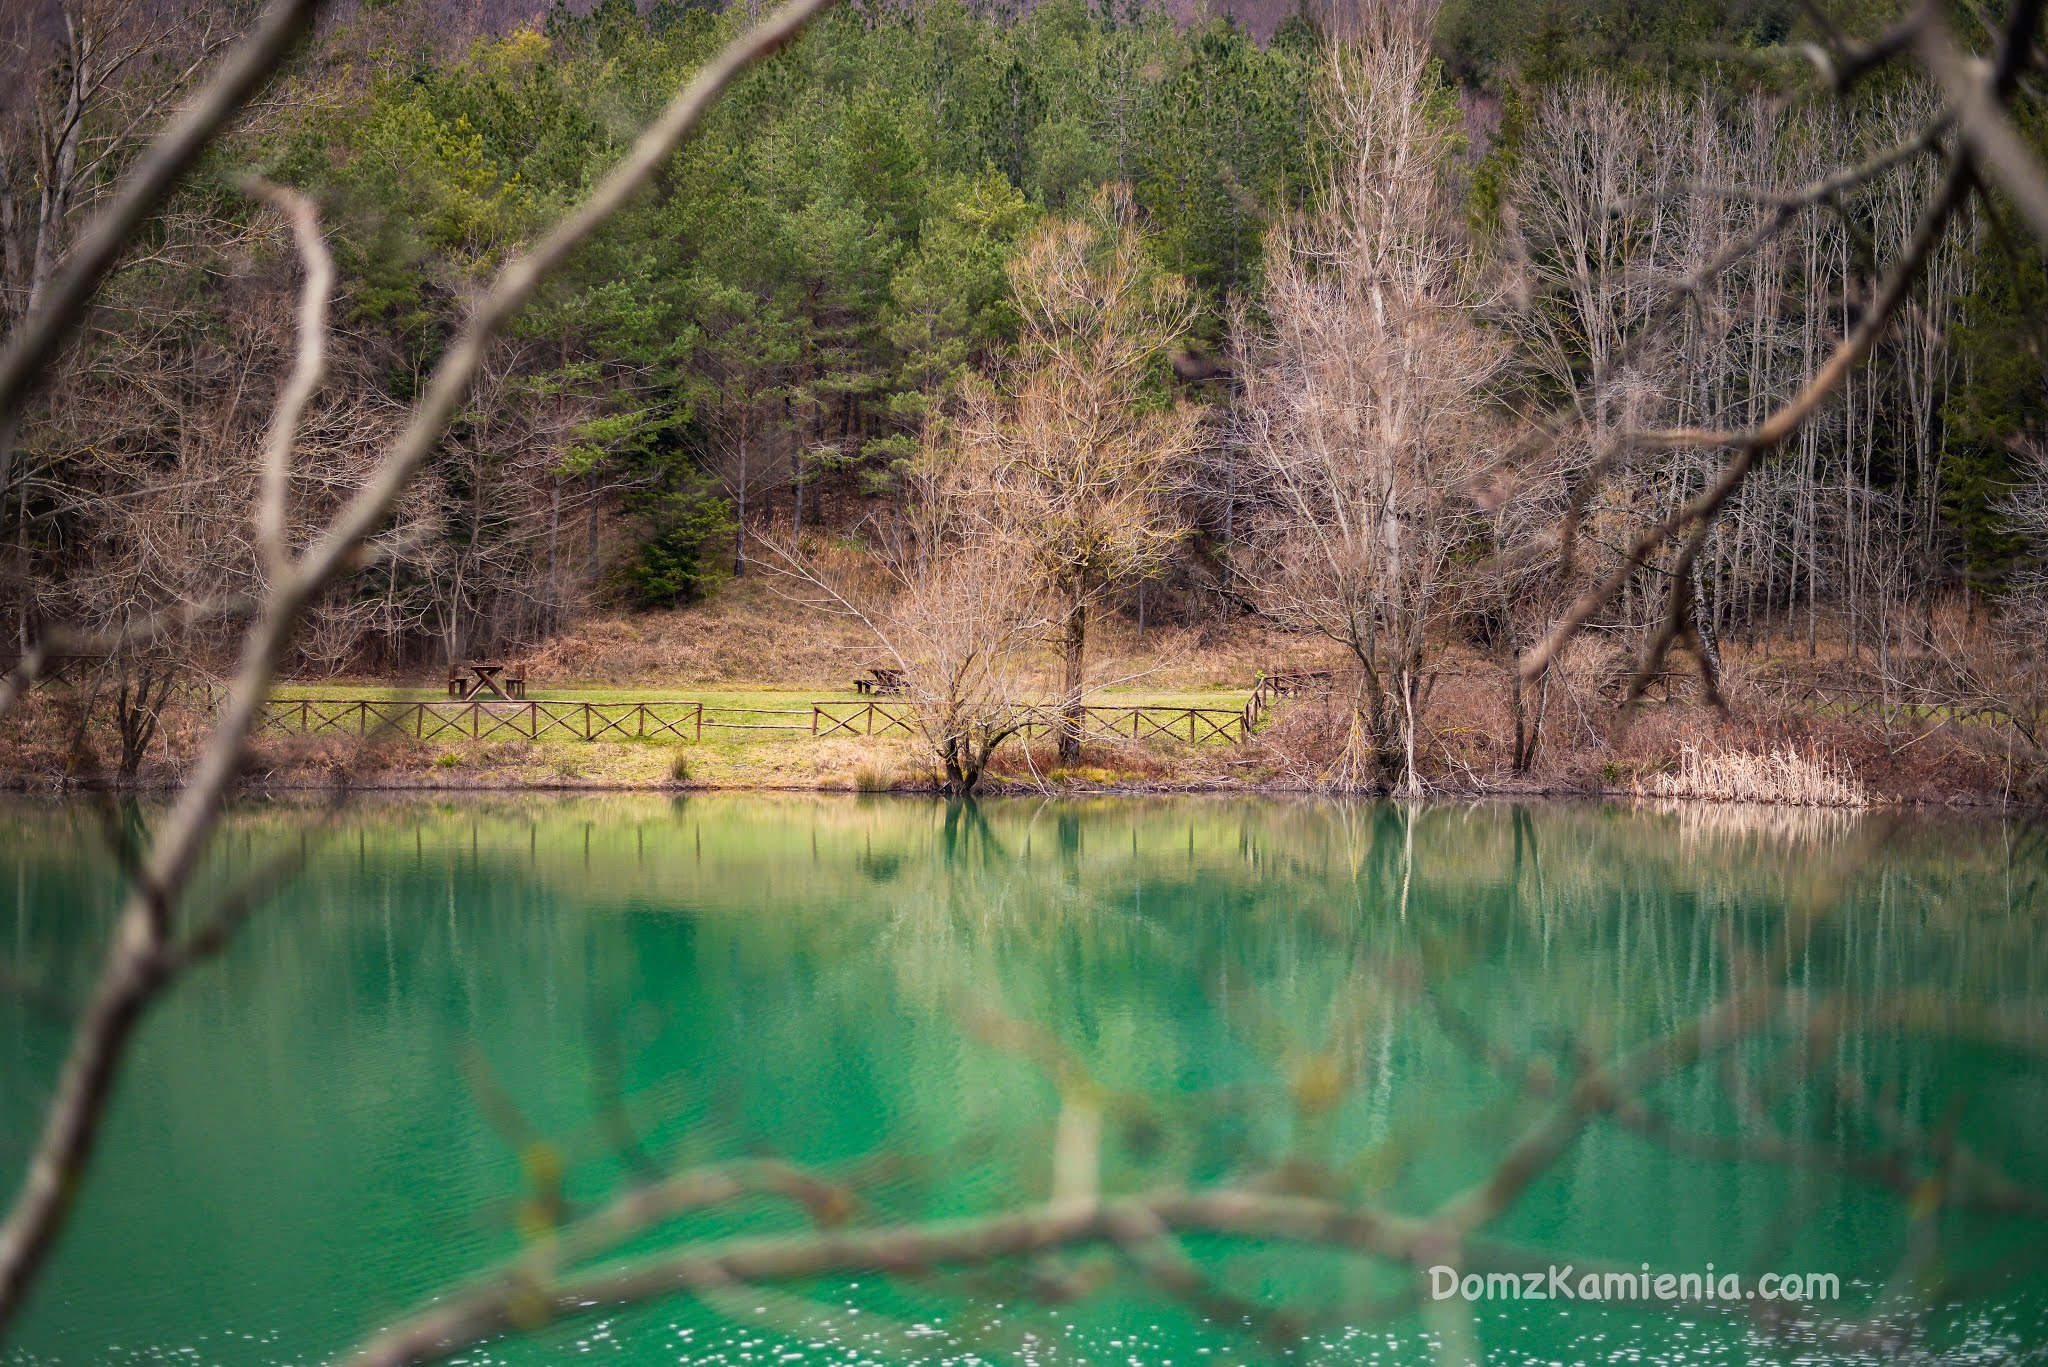 Lago di ponte Tramazzo Dom z Kamienia